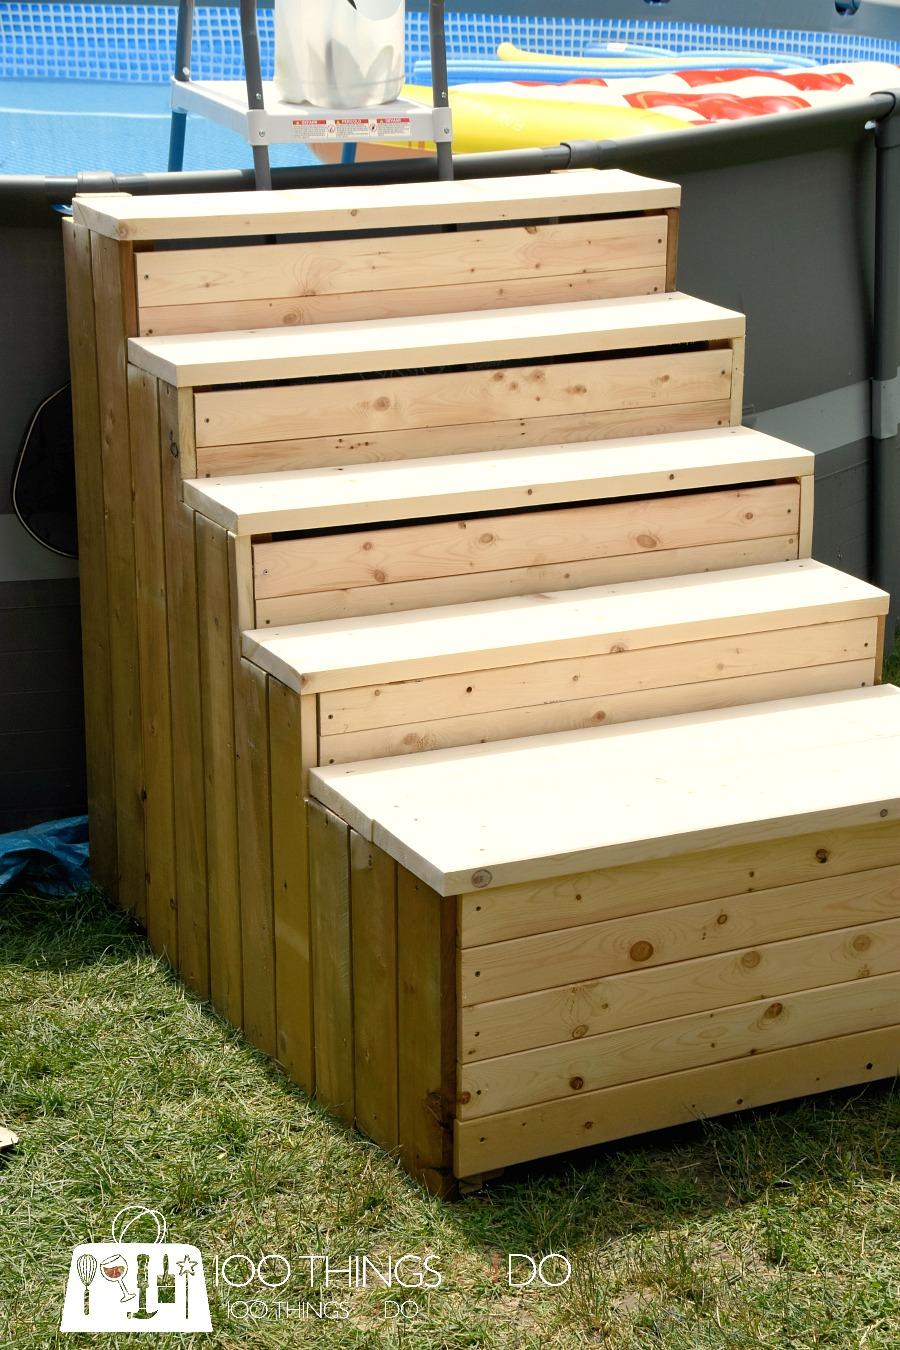 how to build above ground pool stairs intex pool stairs diy pool ladder